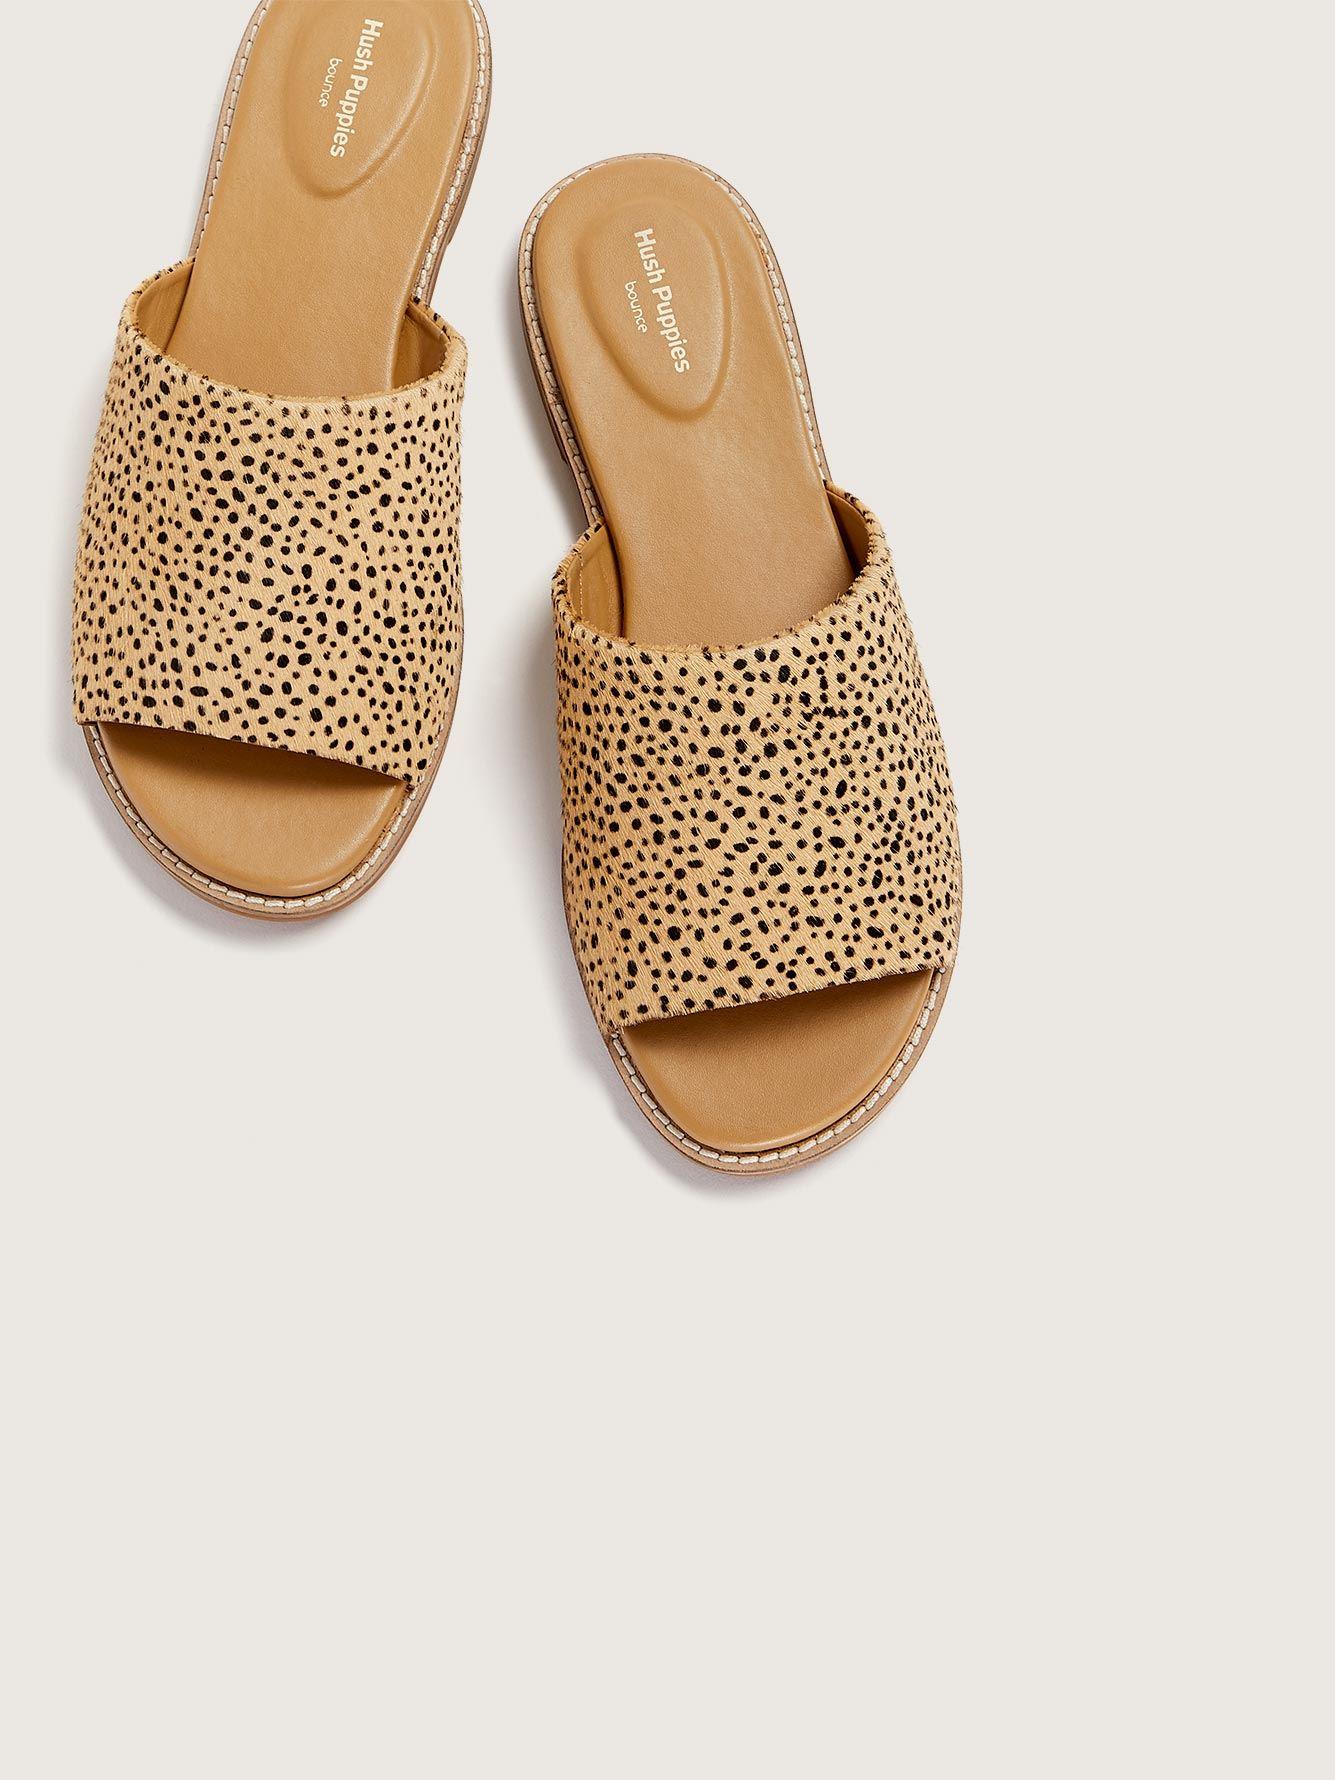 hush puppies sandals canada